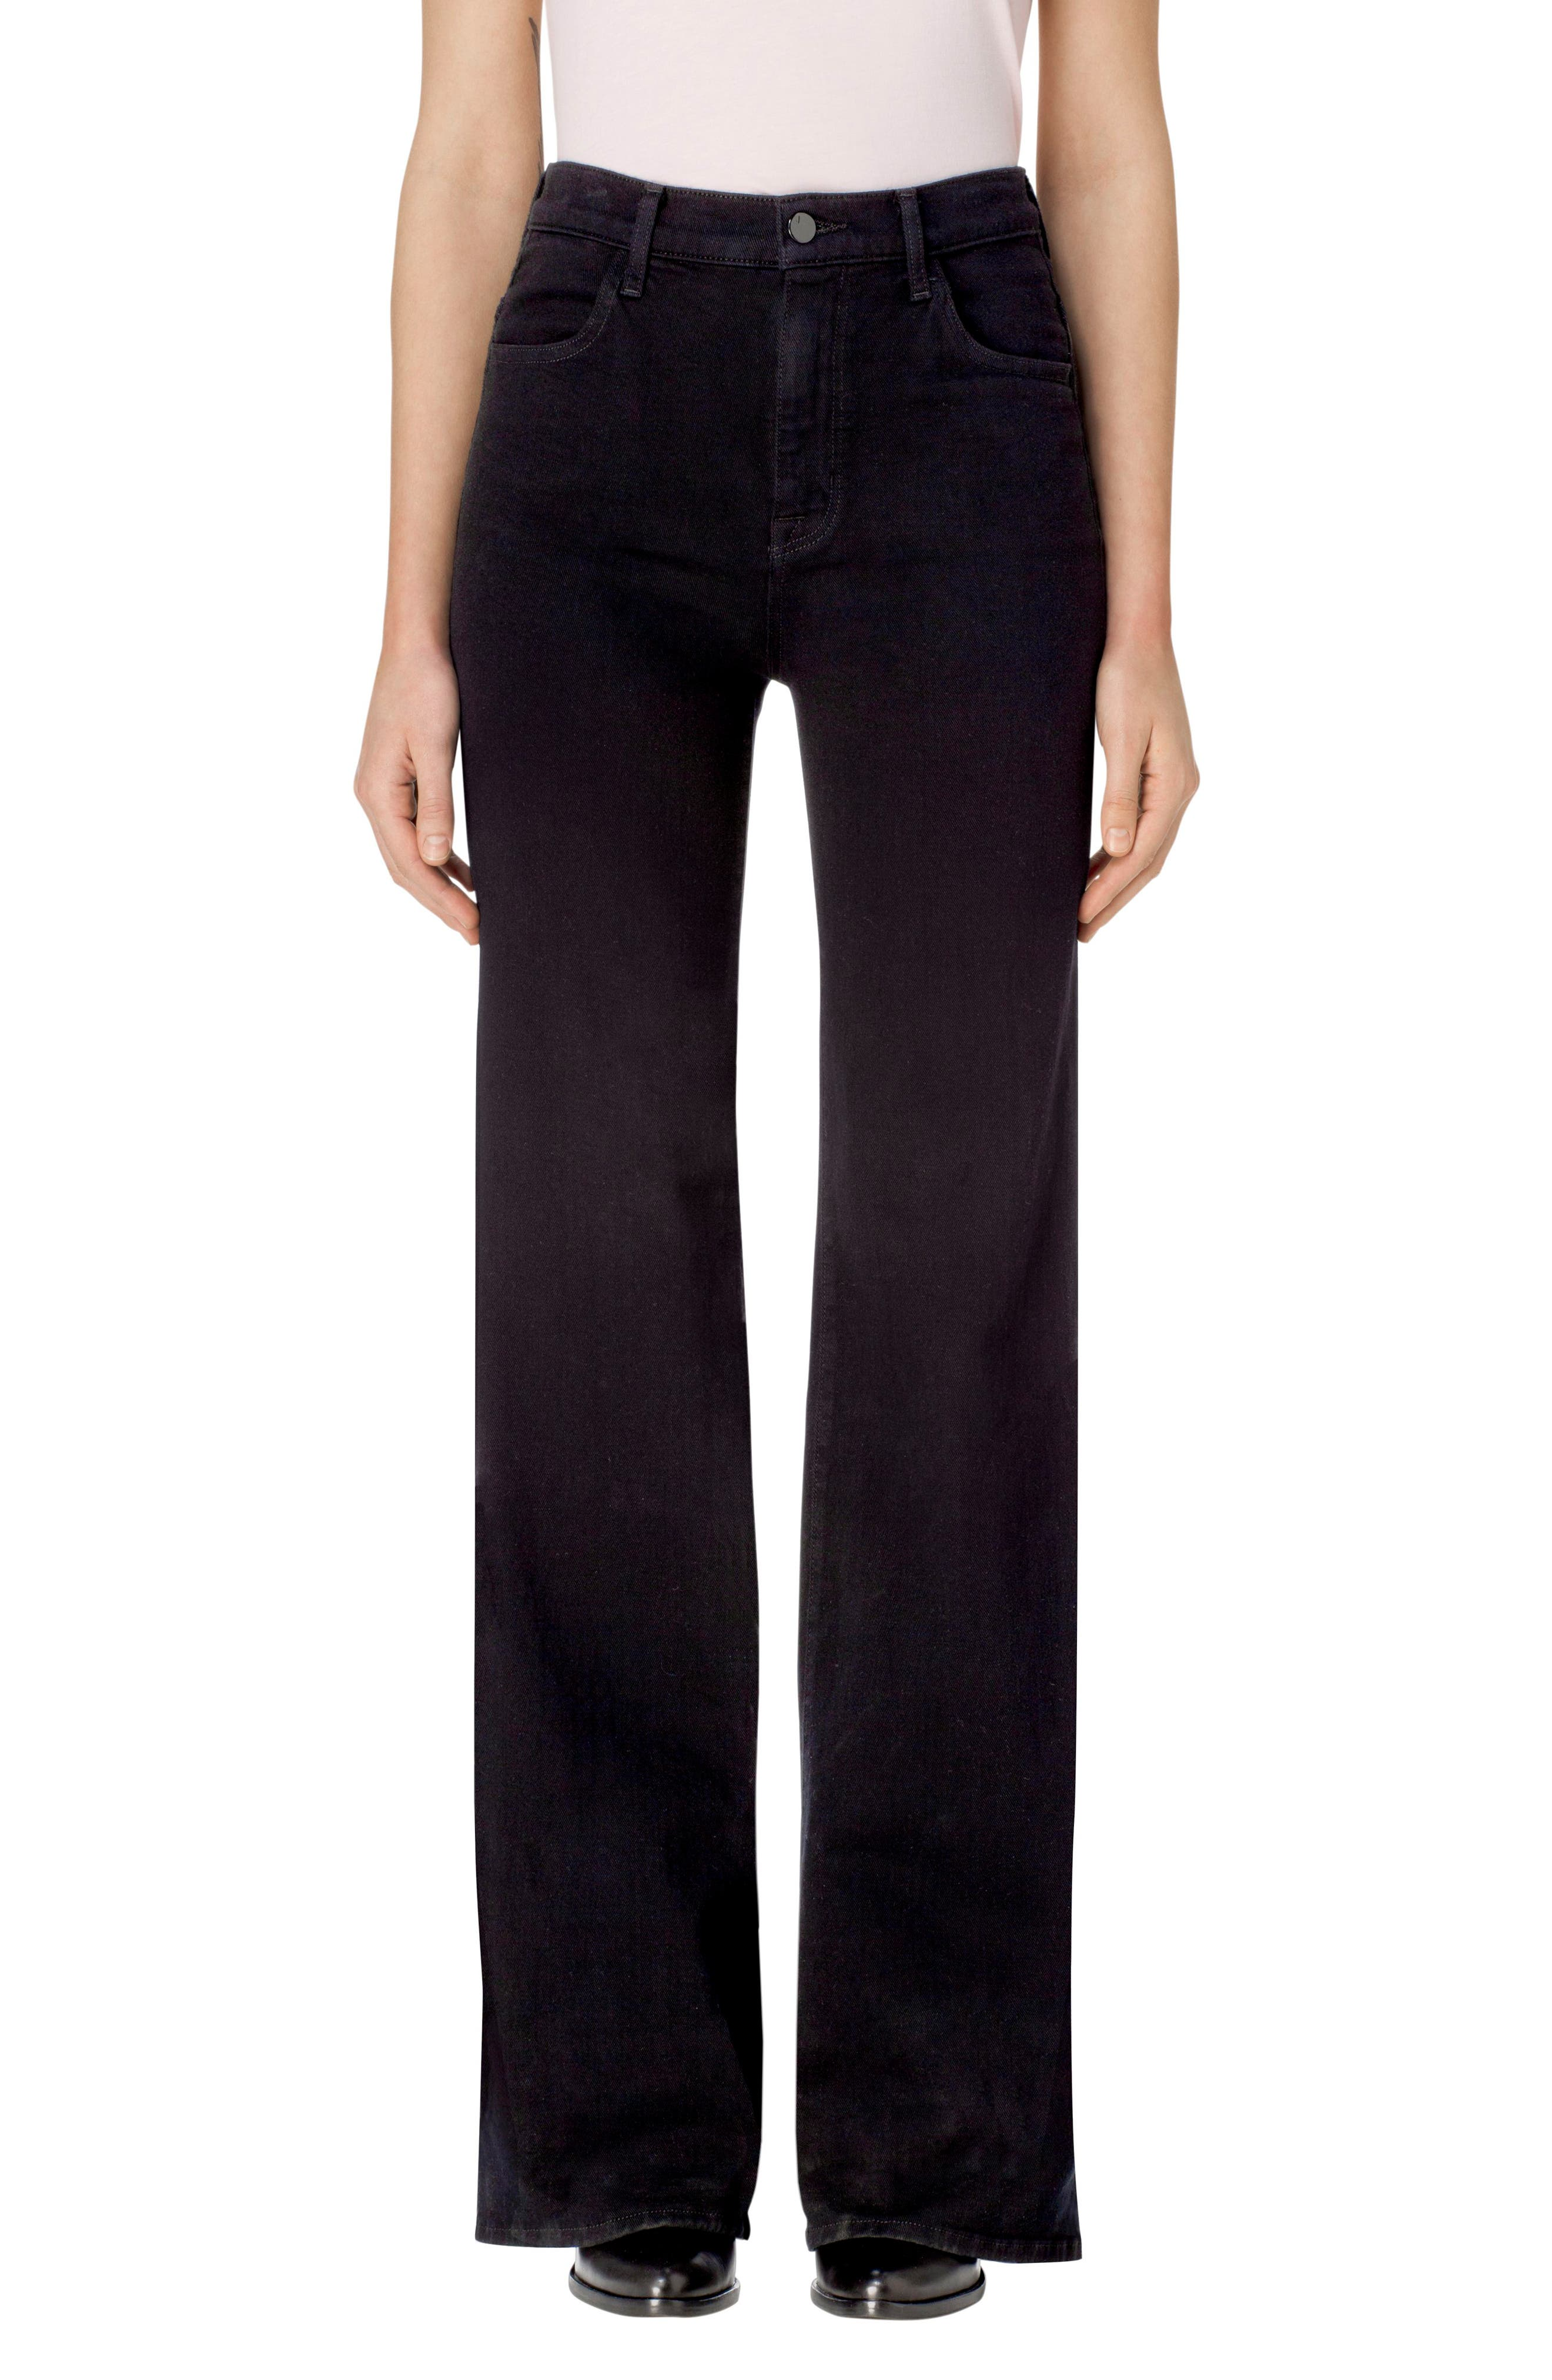 Joan High Waist Wide Leg Jeans,                             Main thumbnail 1, color,                             Pitch Black